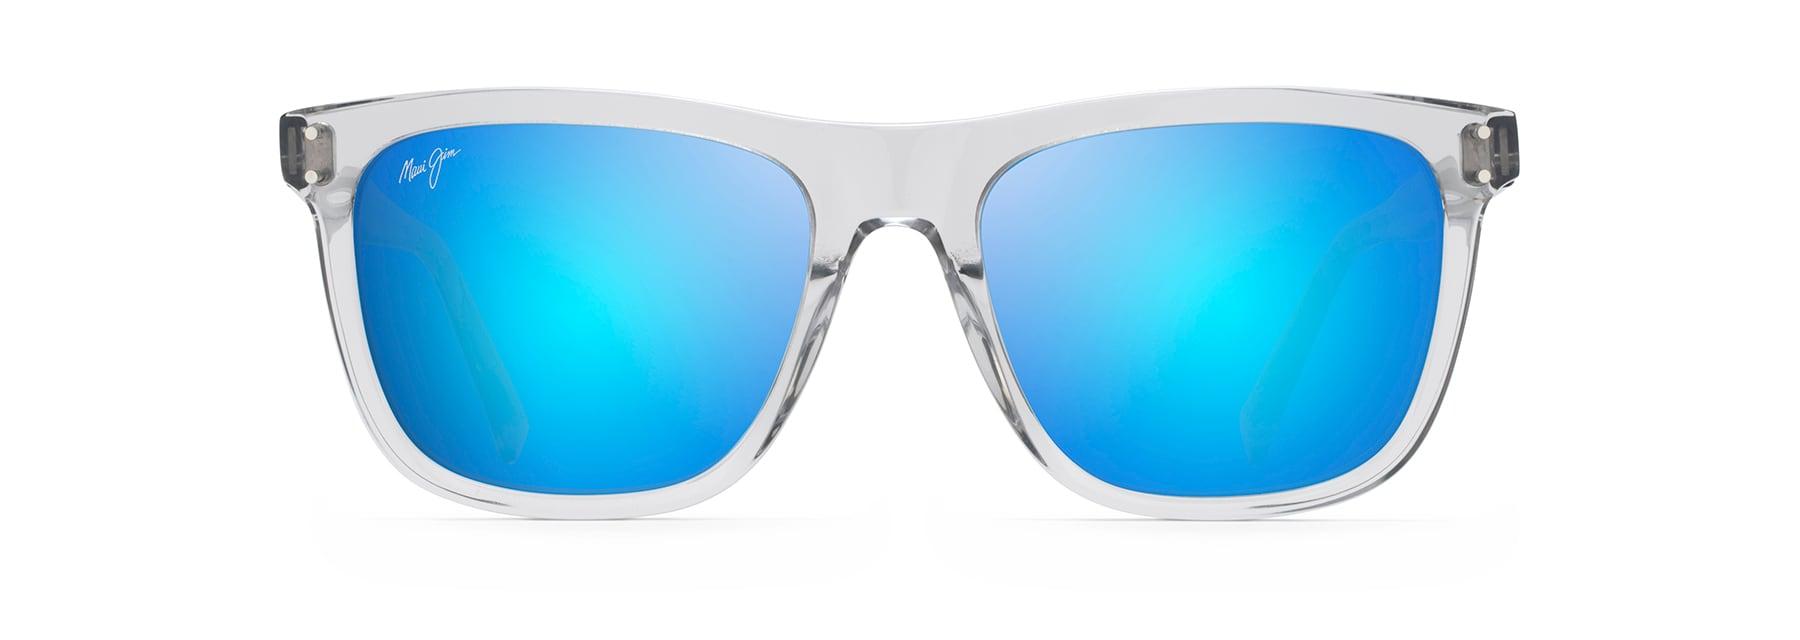 367df5623b70b Maui Jim Ola Polarized Sunglasses - One Size - Matte Black with Dark  Translucent Neutral